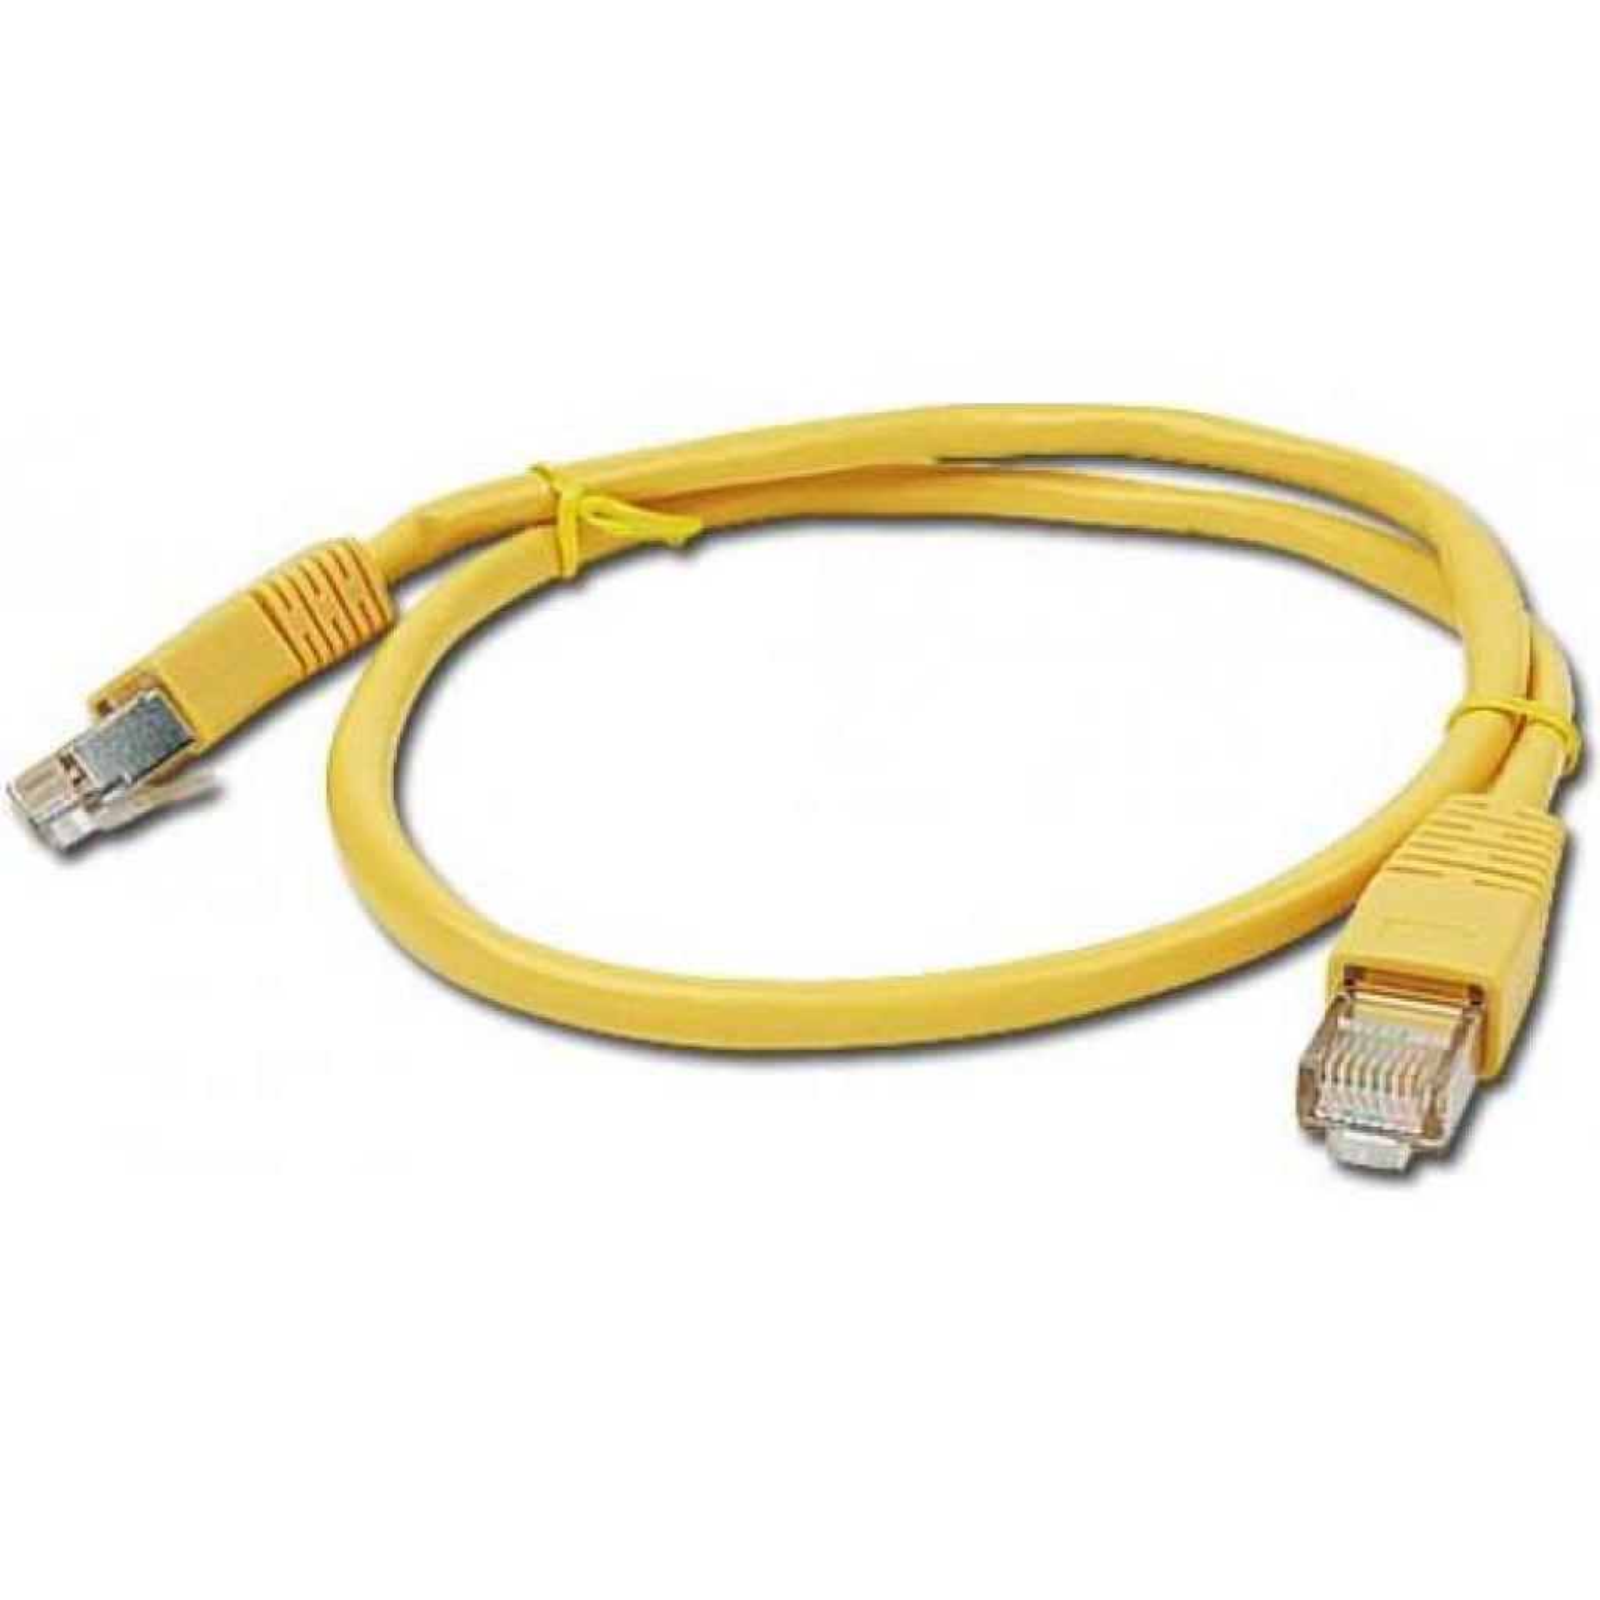 Патч-корд Cablexpert 1м (PP22-1M/Y)